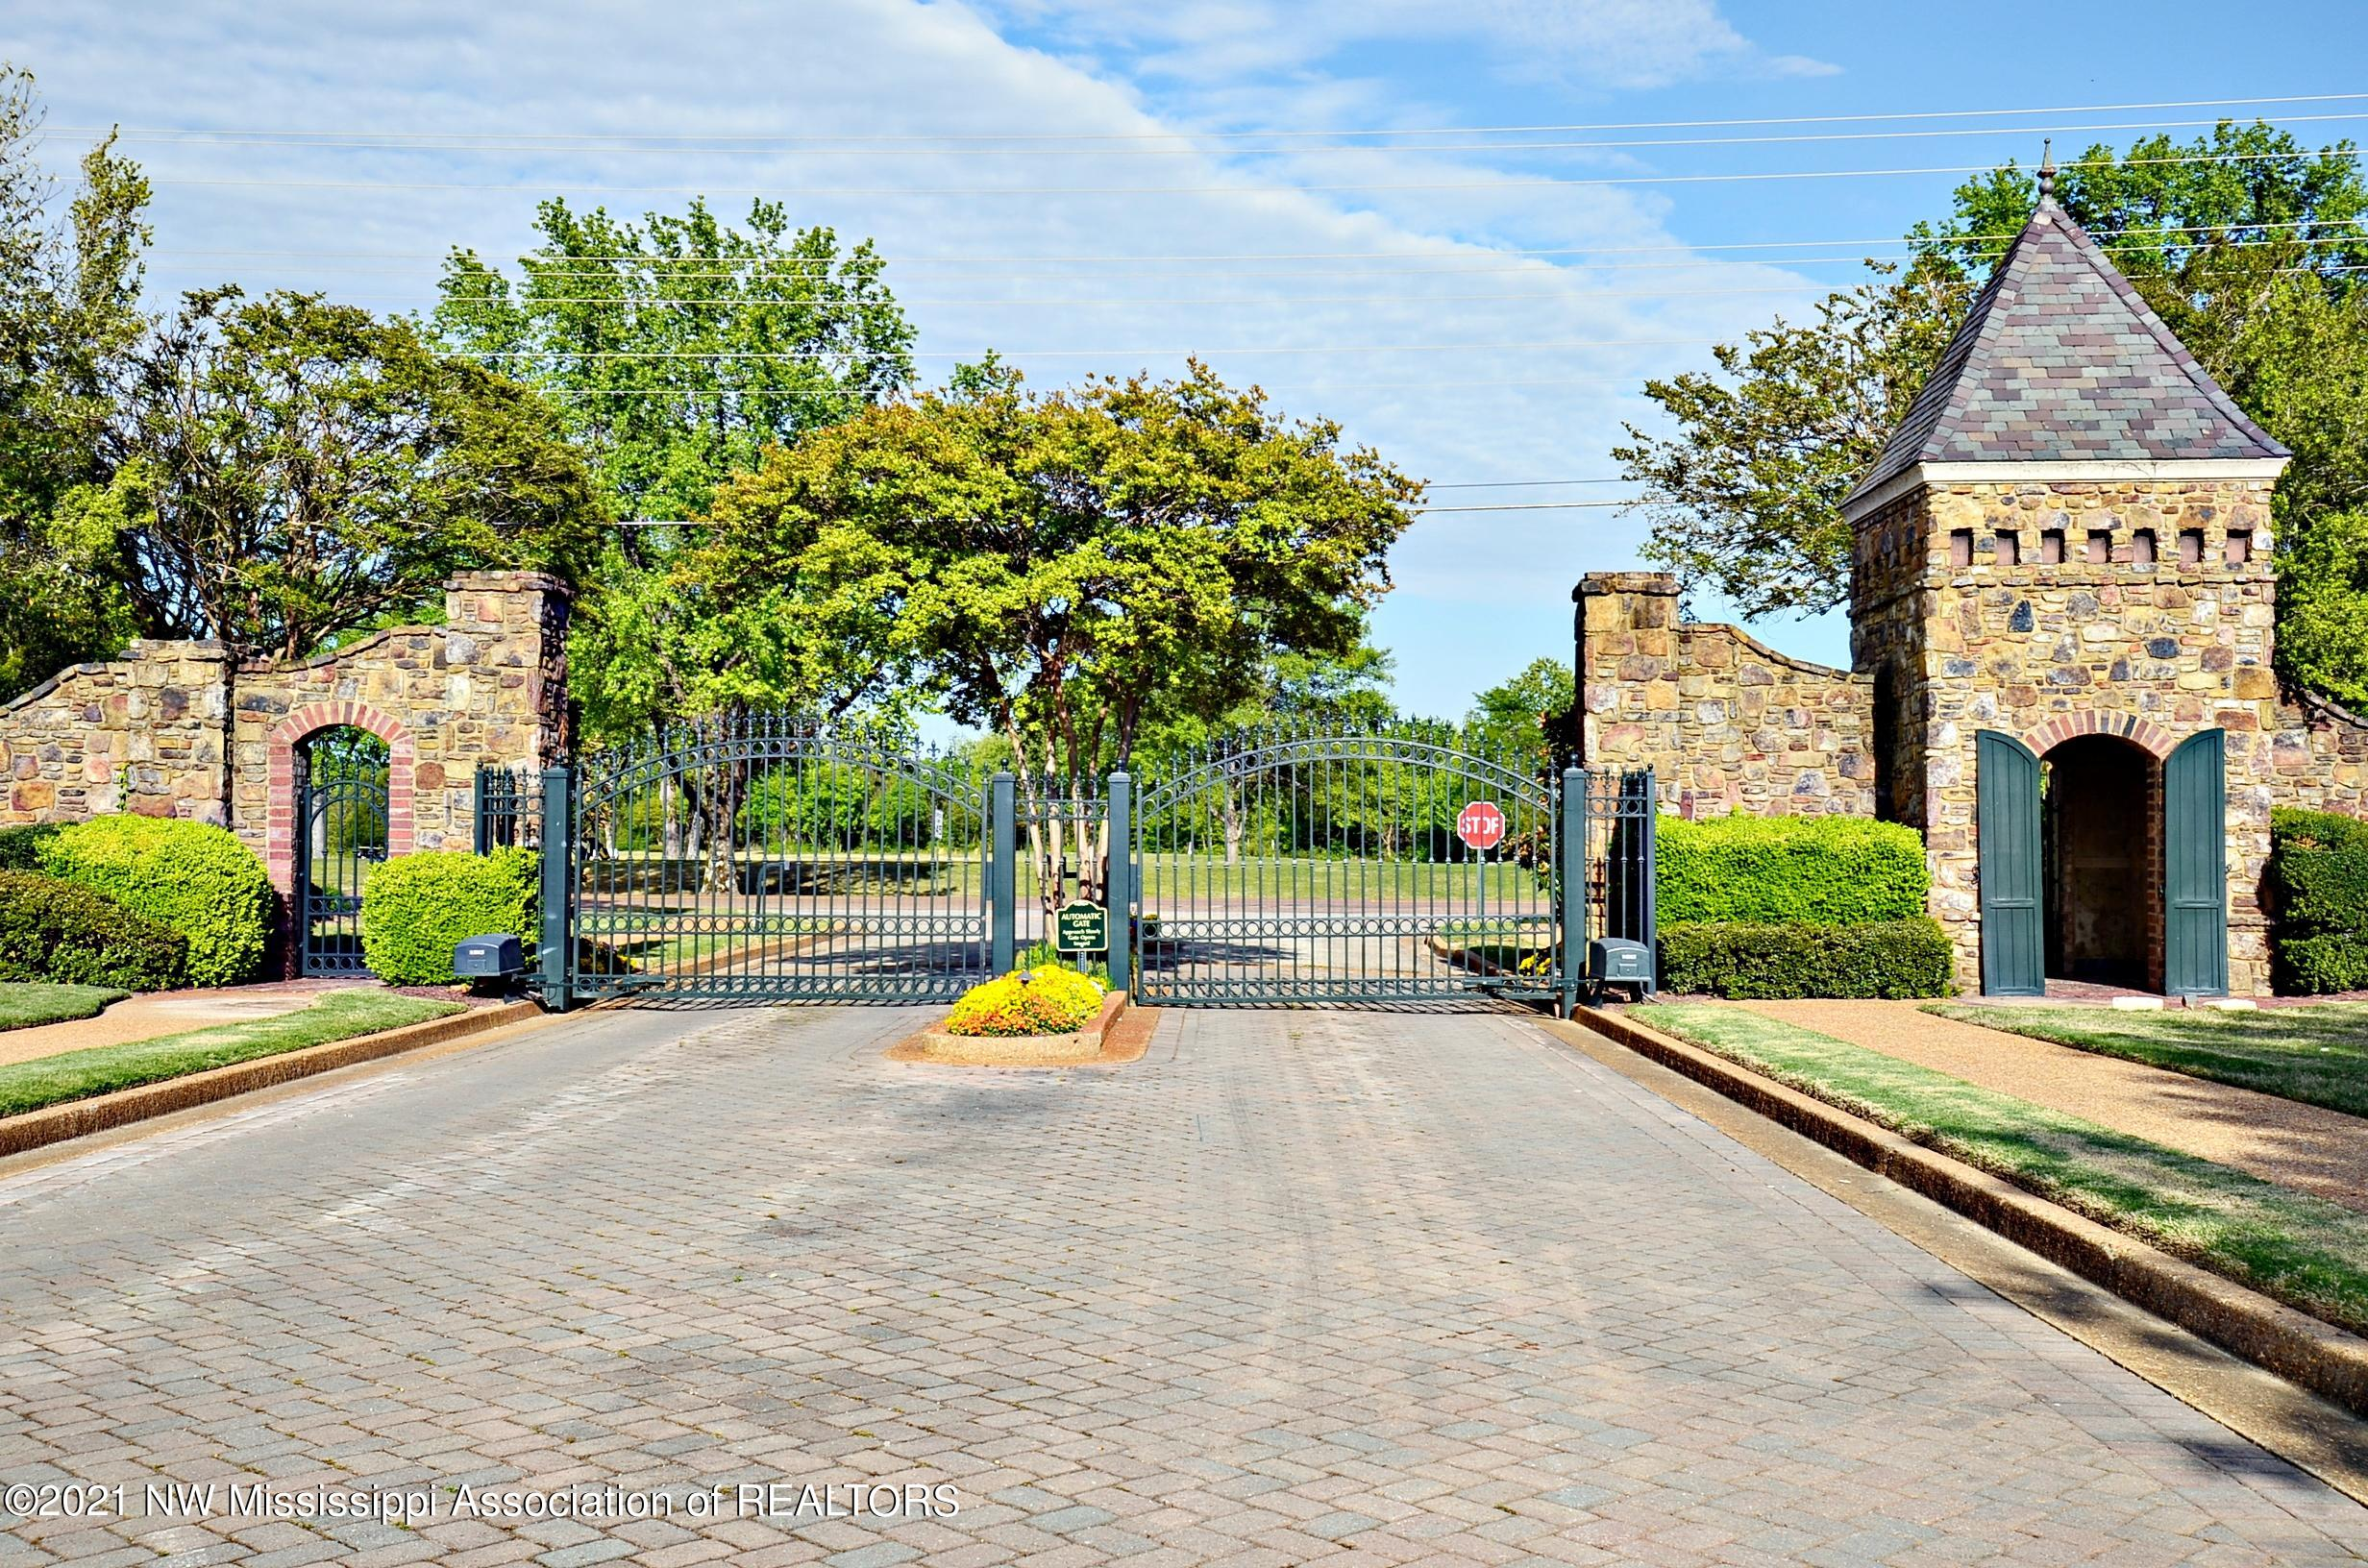 Gated entrance leaving